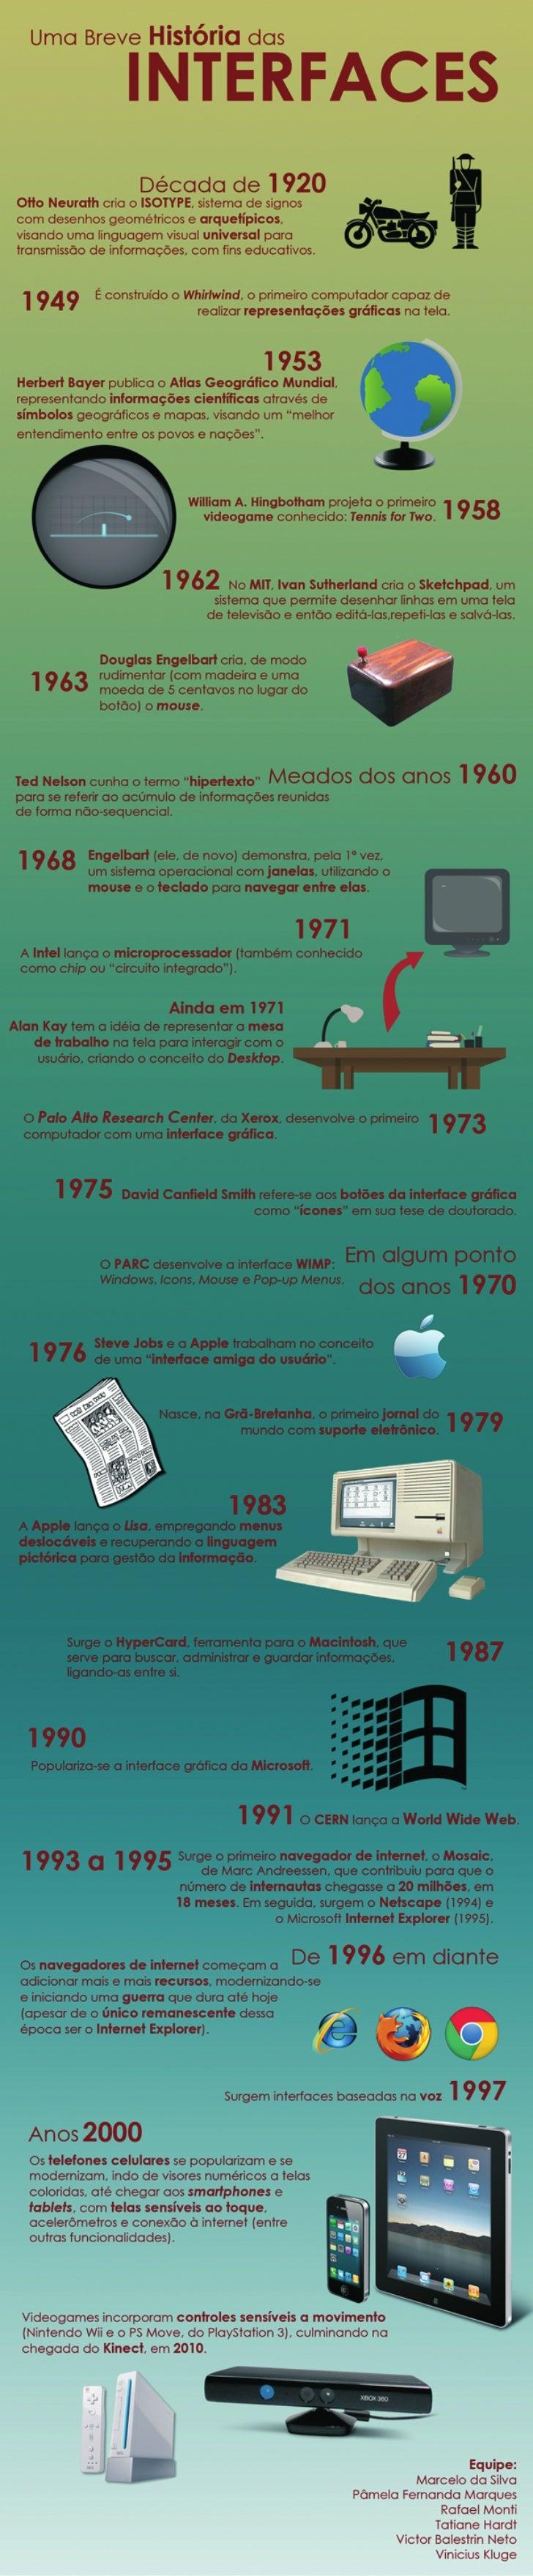 História das Interfaces